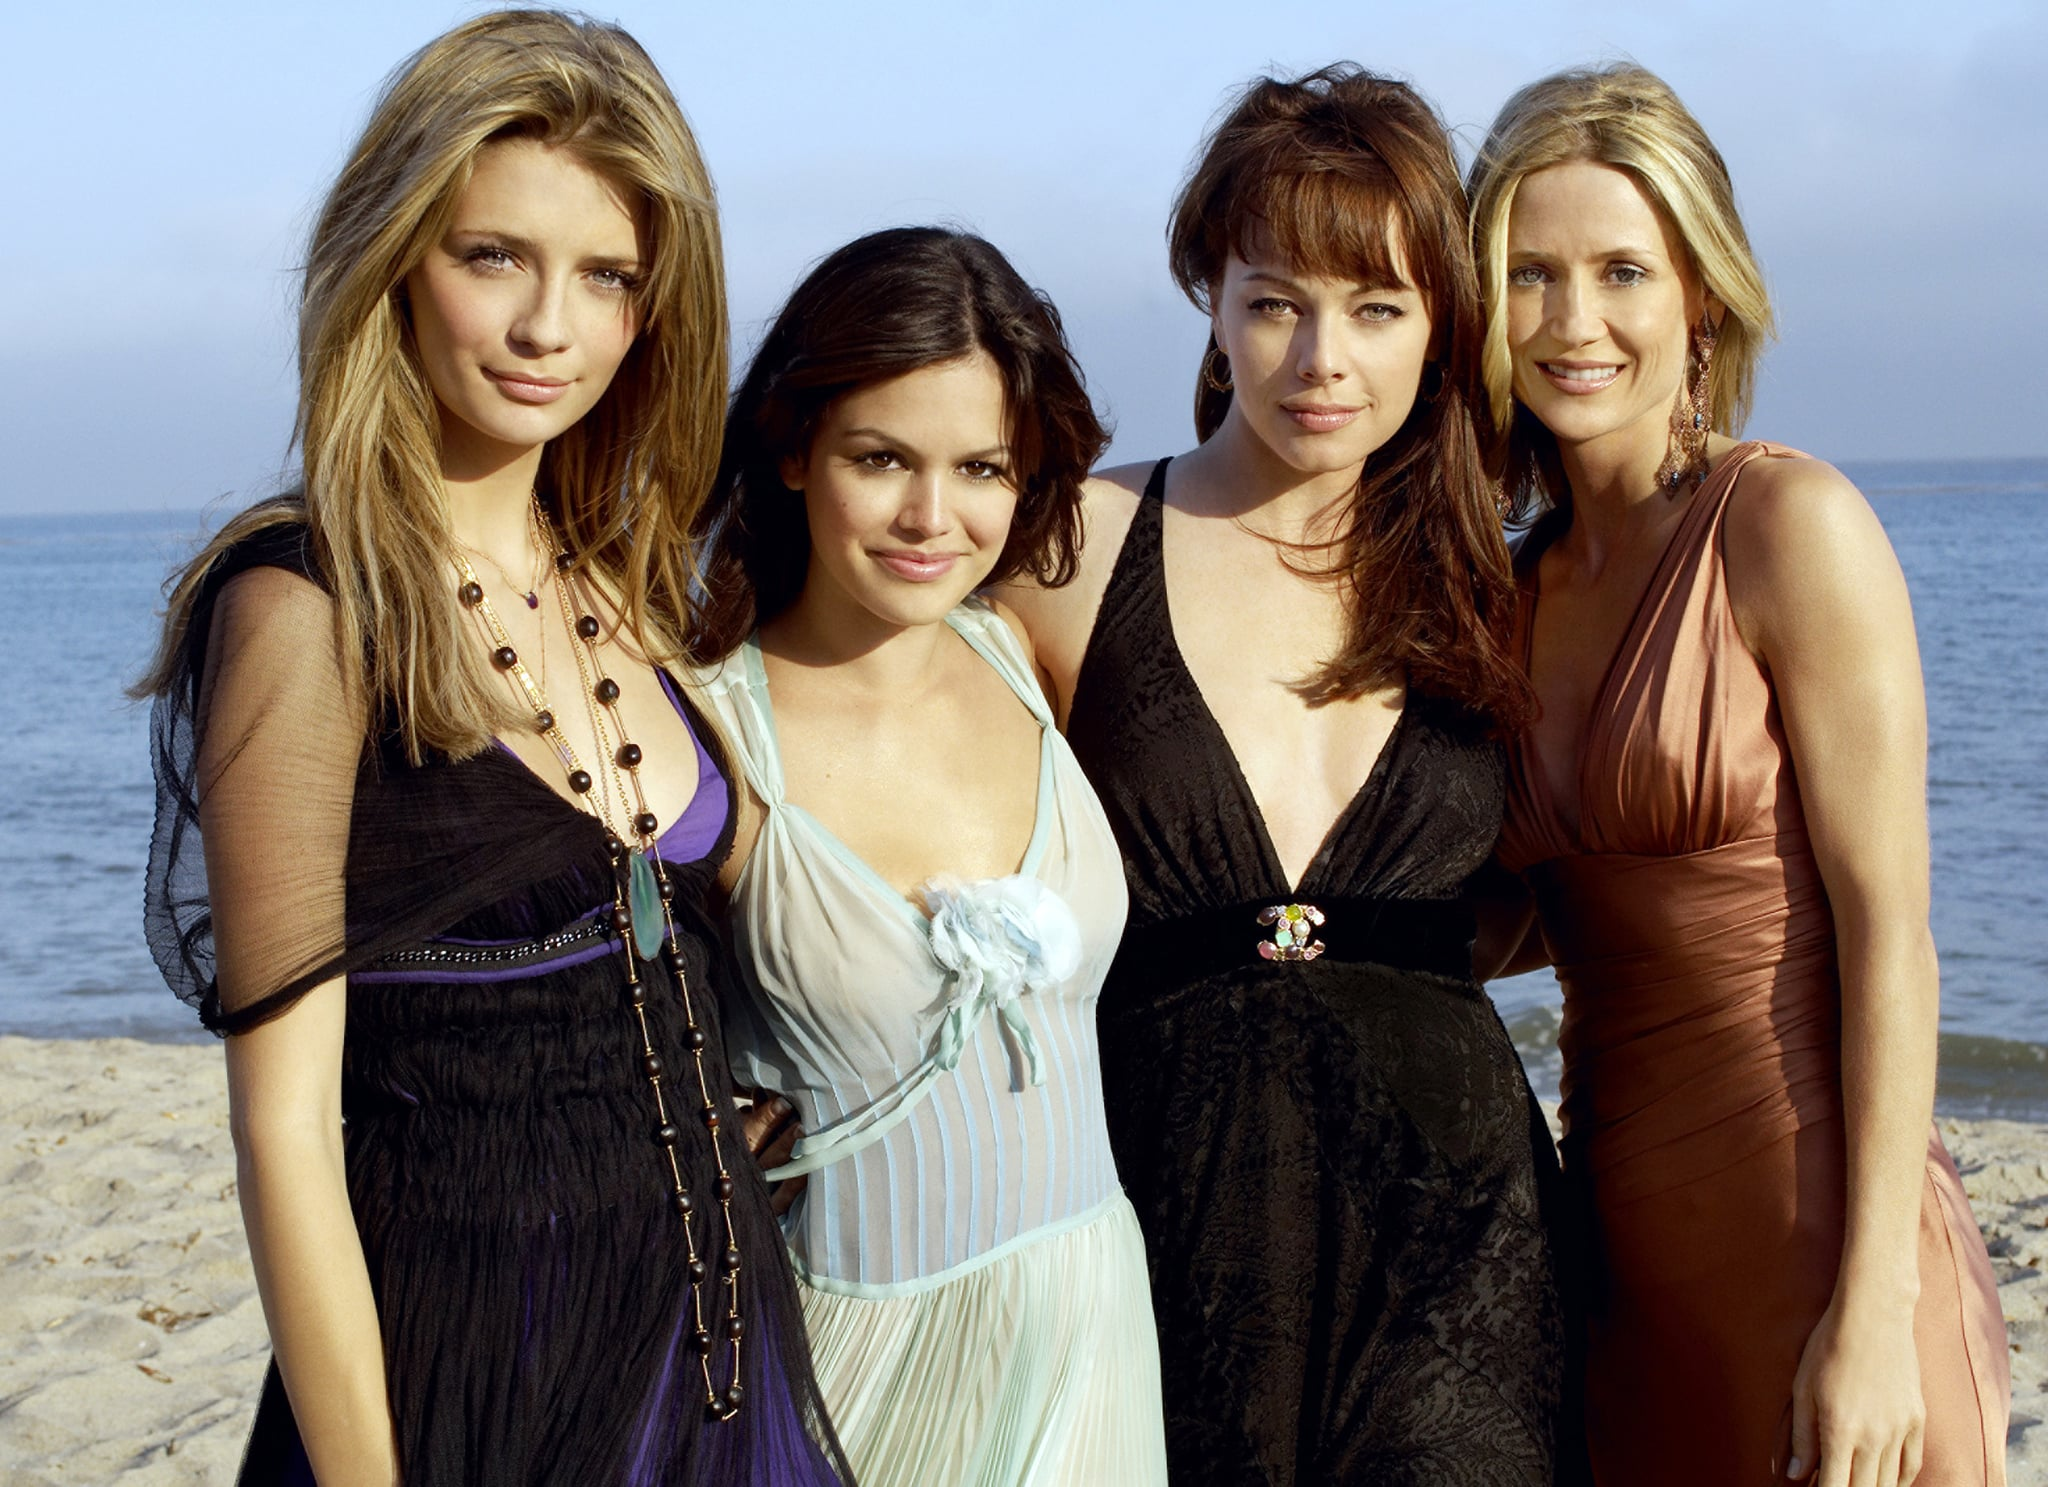 THE O.C., Mischa Barton, Rachel Bilson, Melinda Clarke, Kelly Rowan, (Season 3), 2003-2007. photo:  WB / Courtesy: Everett Collection